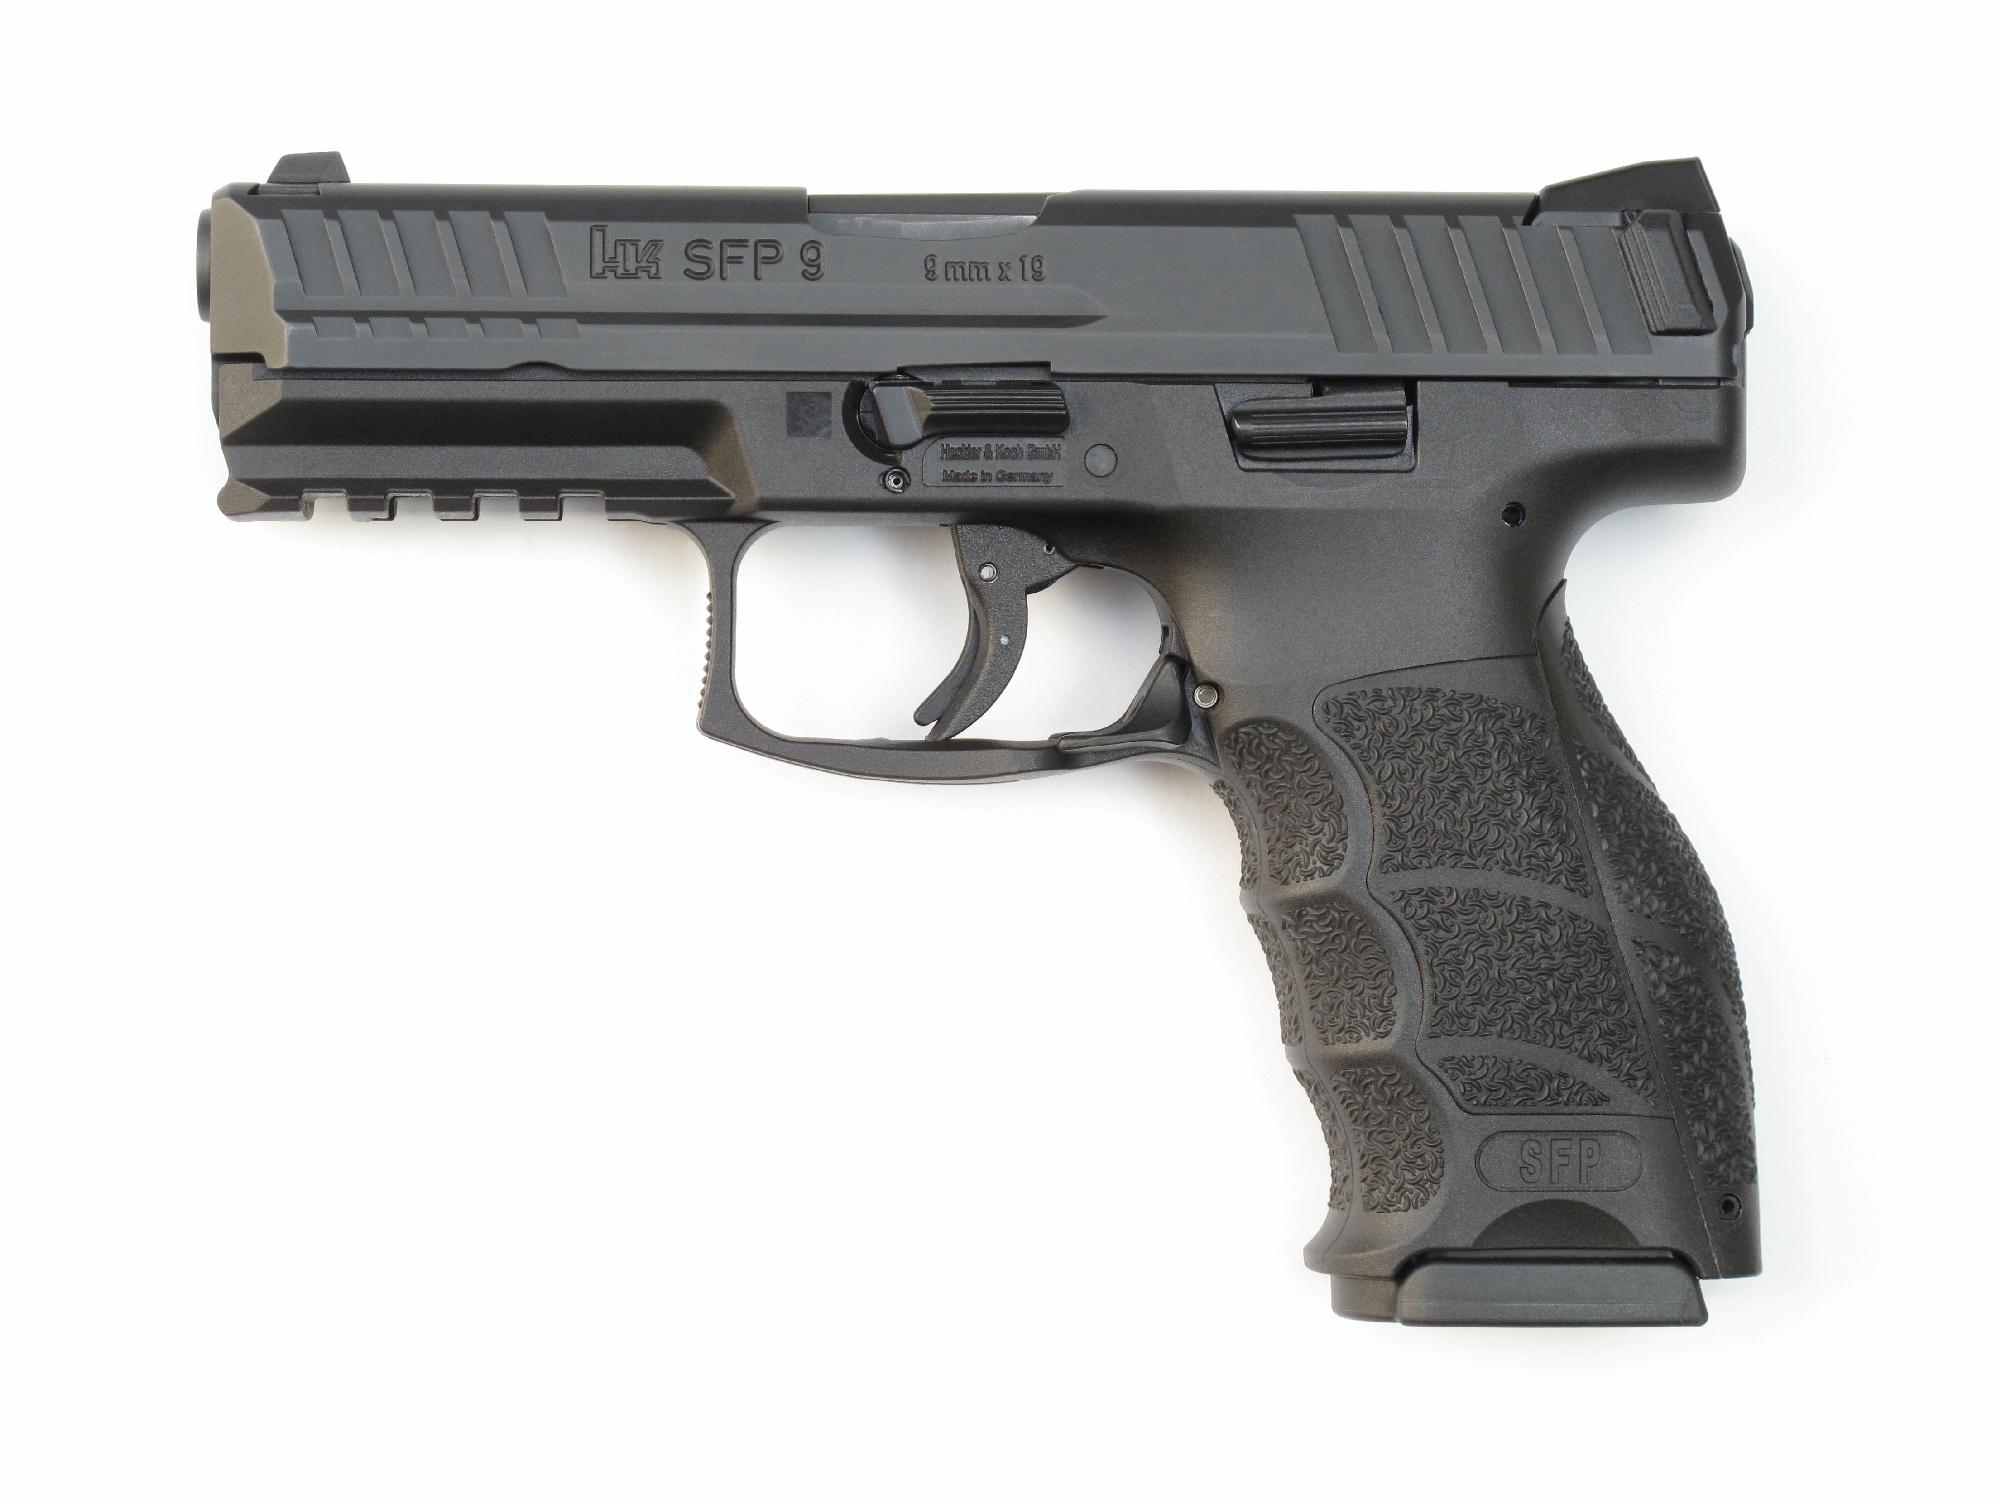 Pistolet Heckler & Koch modèle SFP9 en calibre 9 mm Parabellum.